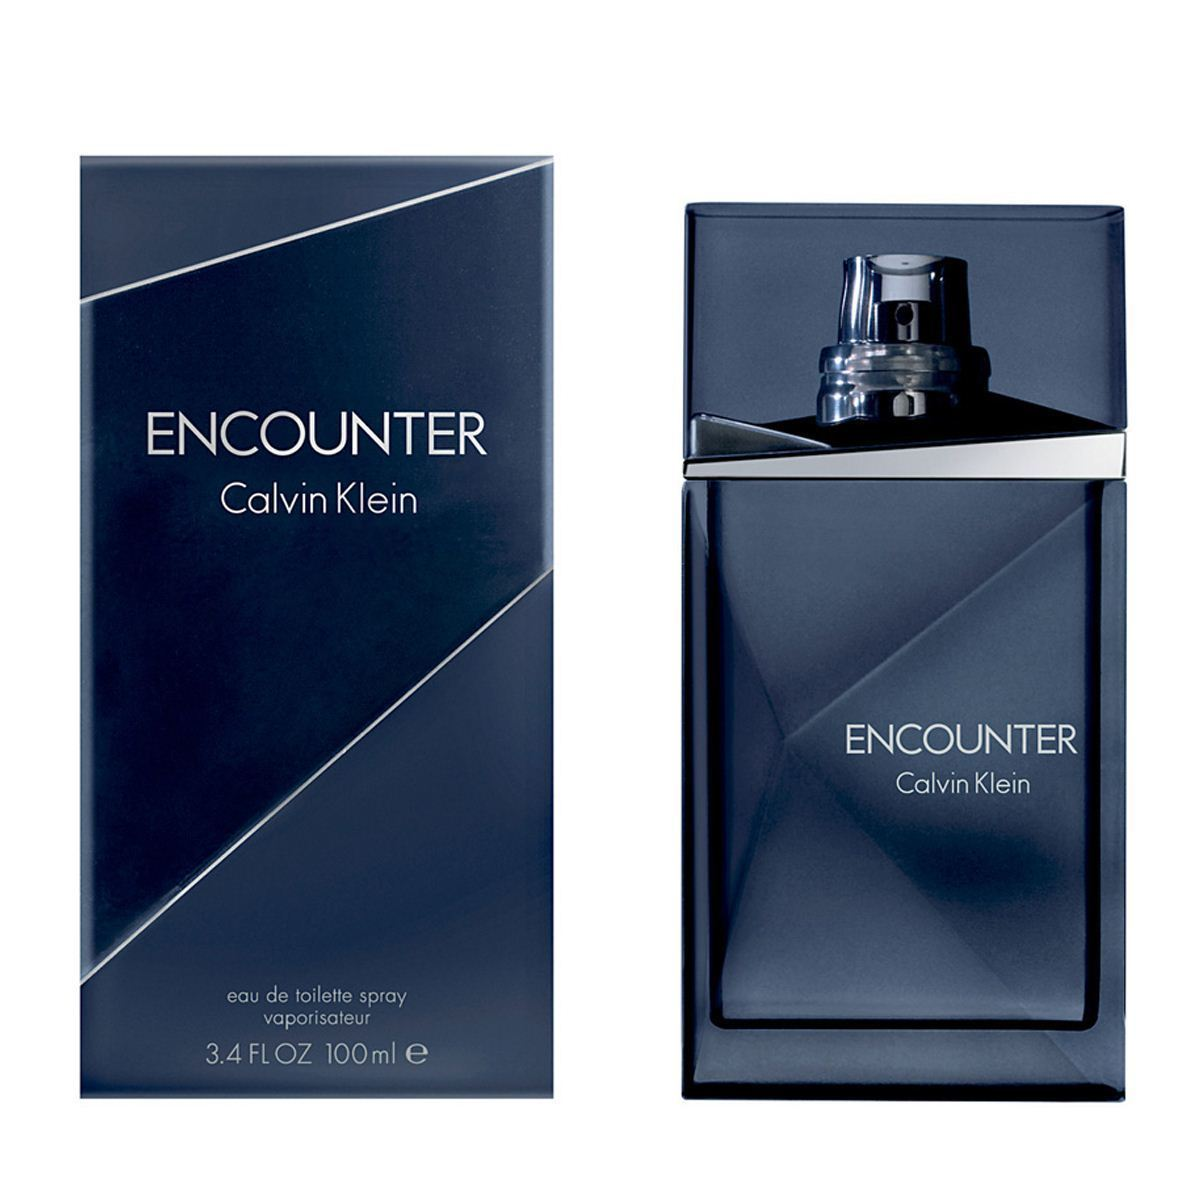 Encounter CK Perfume